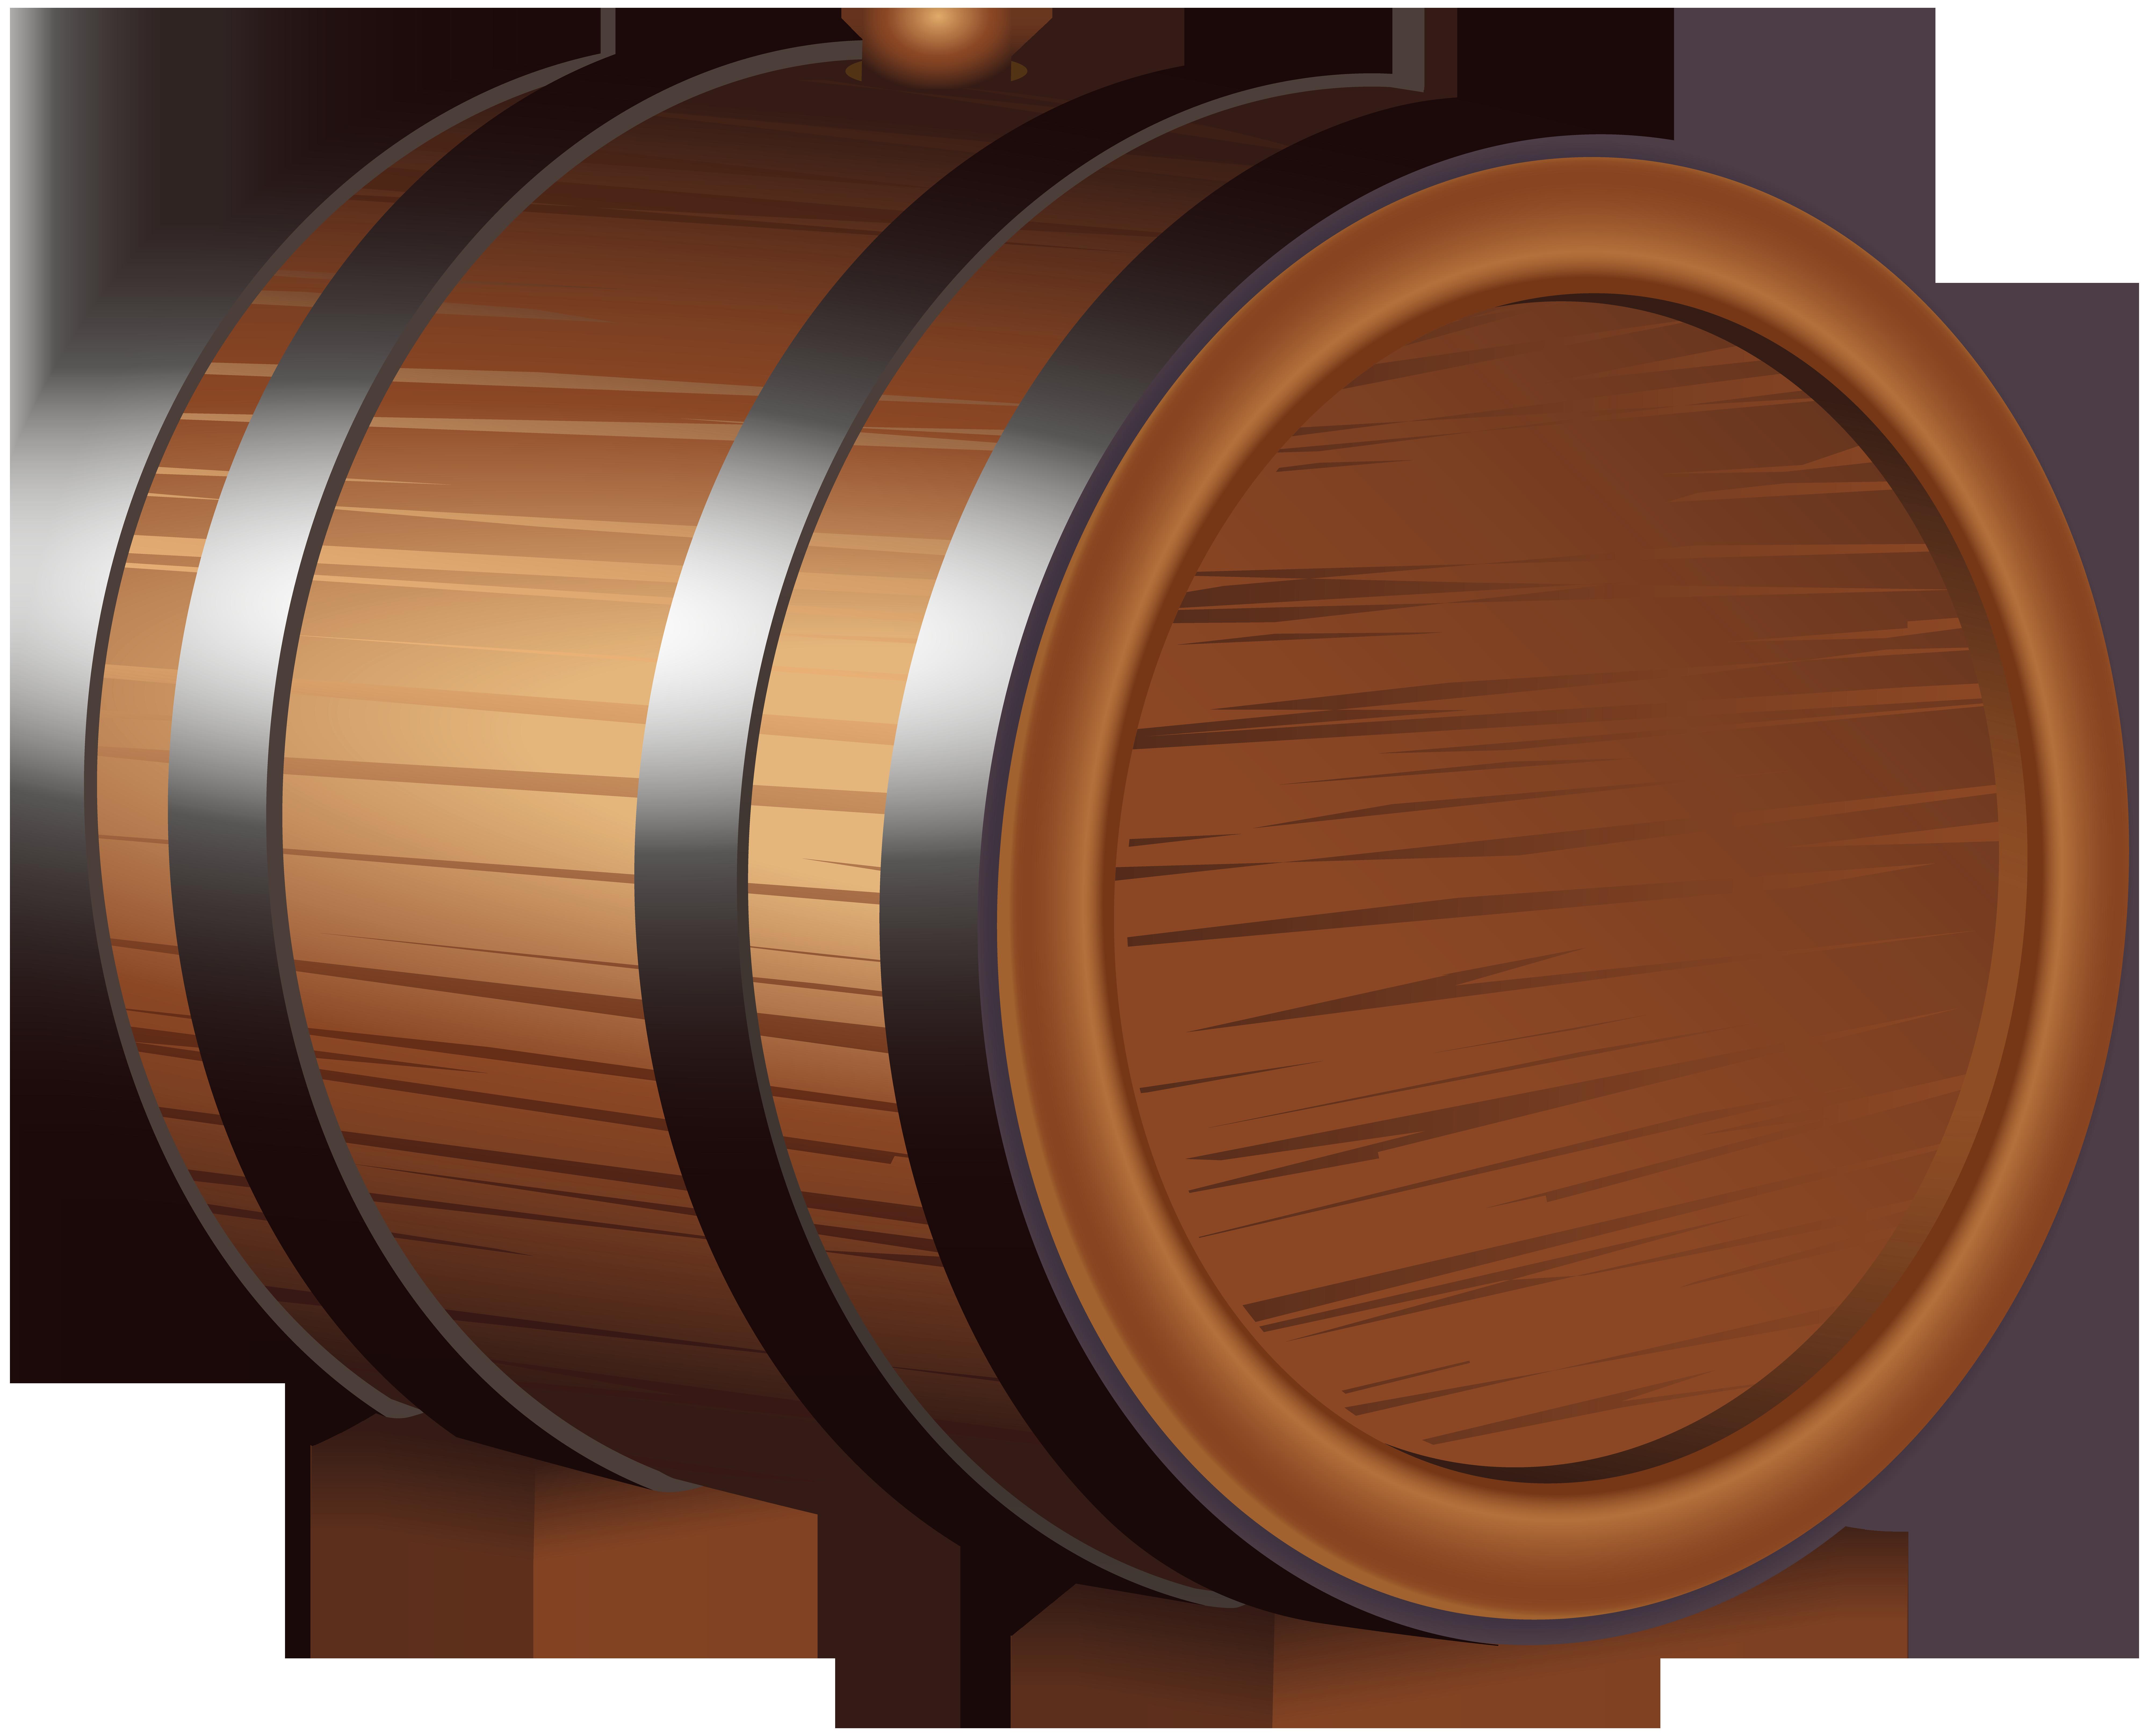 image freeuse stock Barrel clipart. Wooden png clip art.